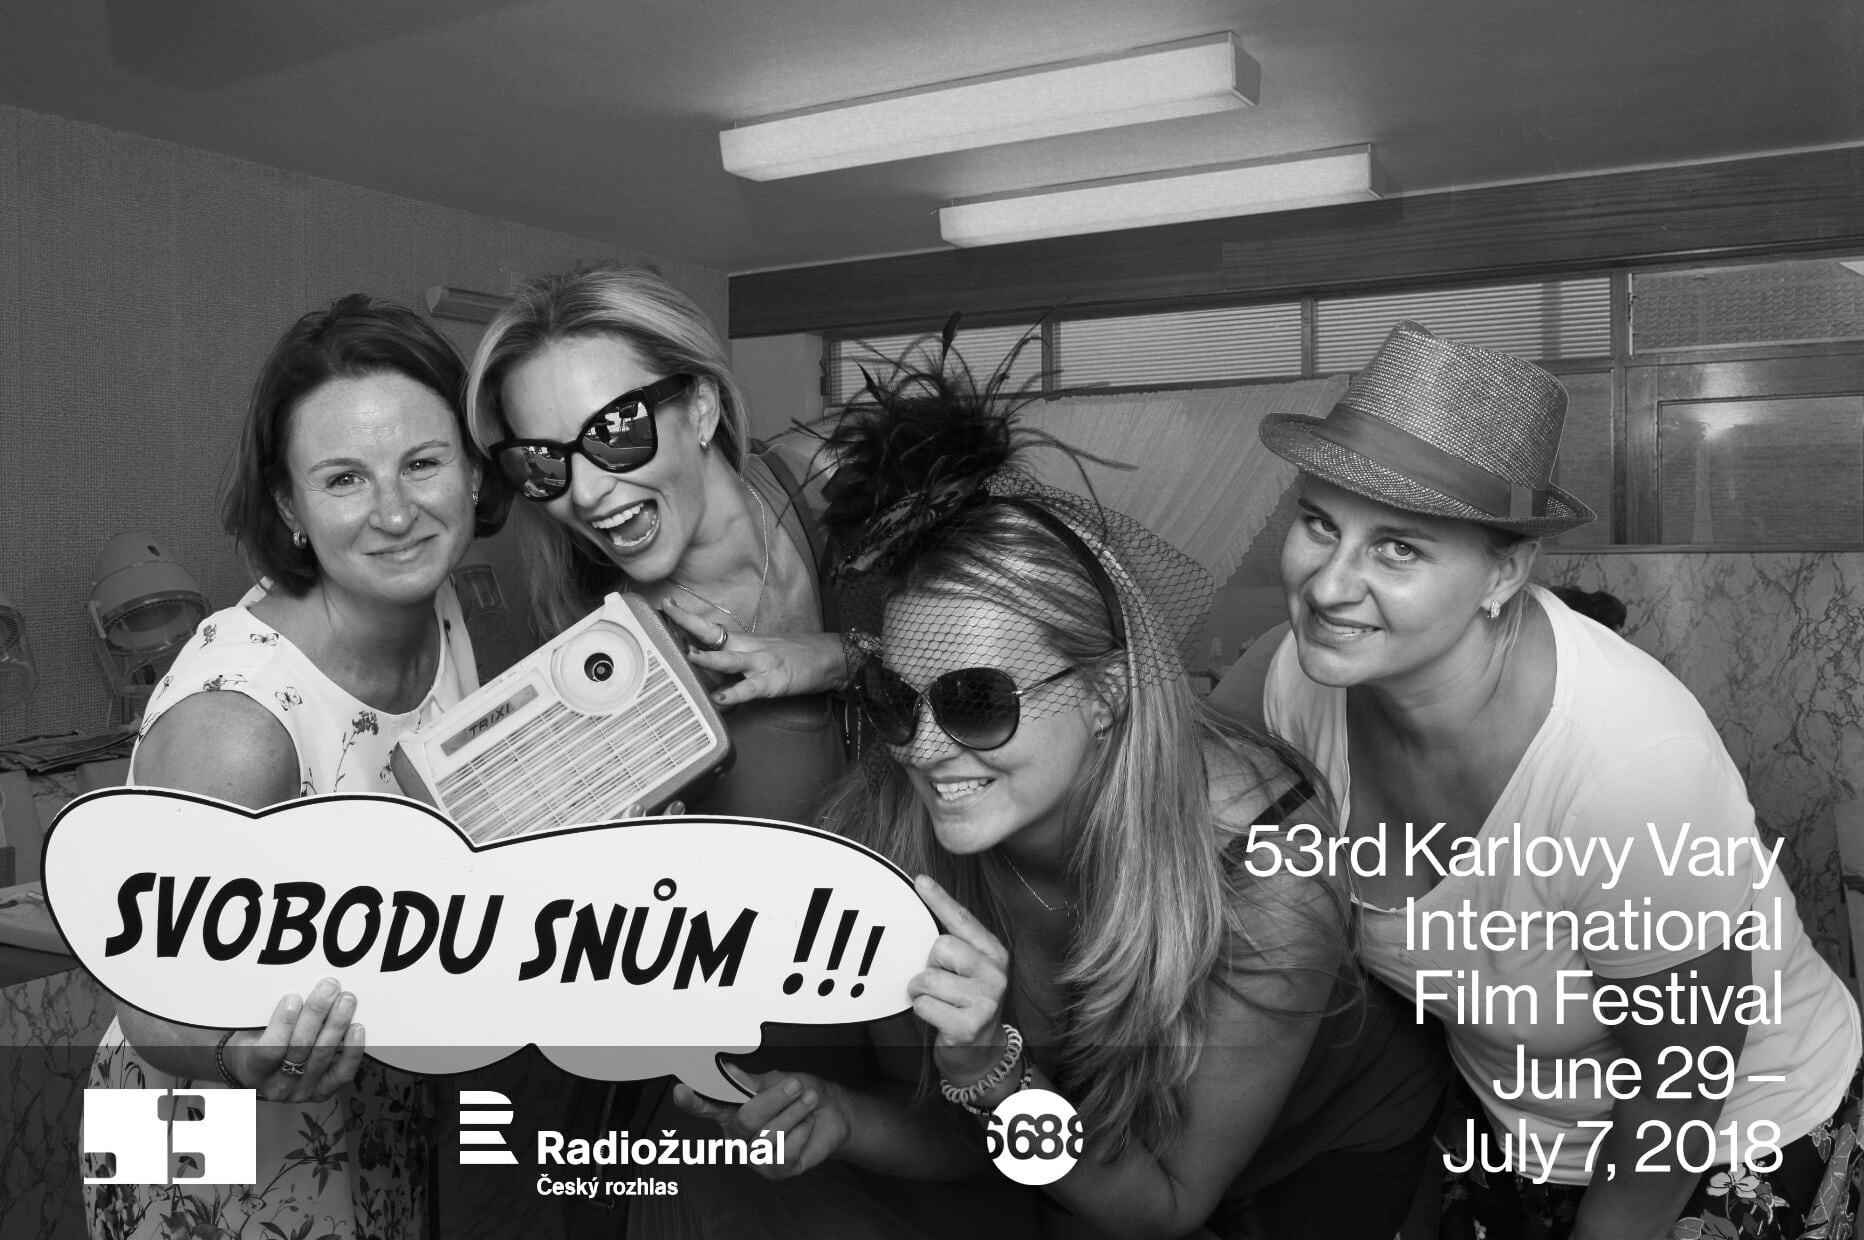 fotokoutek-festival-karlovy-vary-radiozurnal-mff-kv-2-7-2018-452224